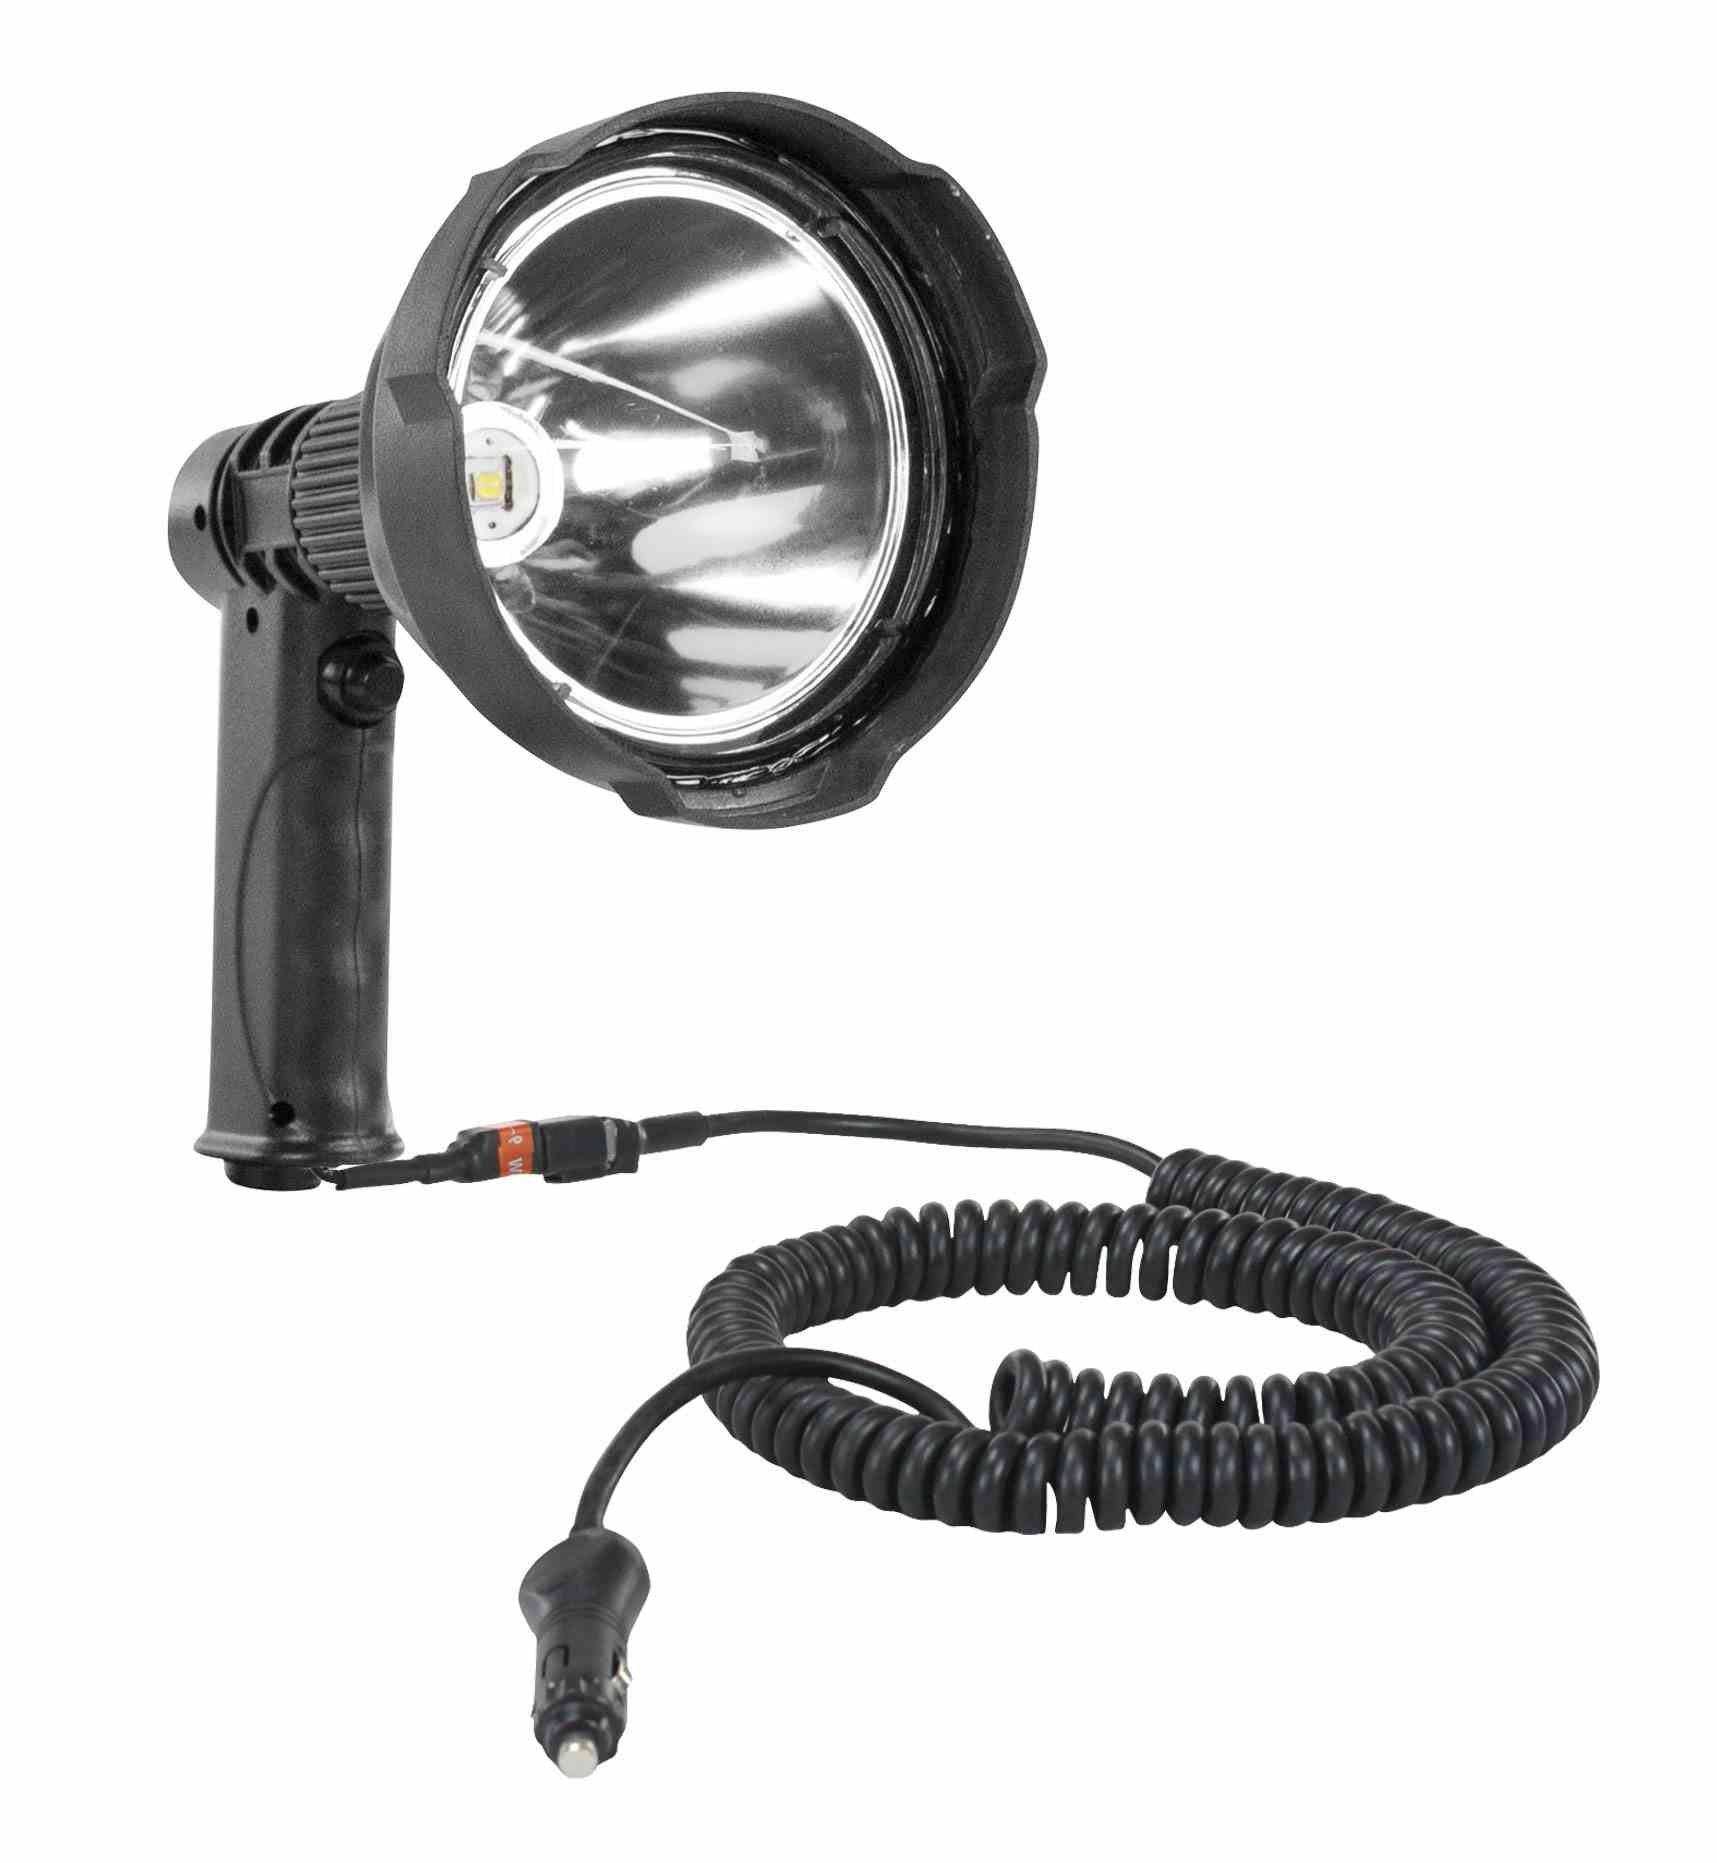 Larson Electronics HL-85-LEDWRE-45W-CPR-16CP HL-85-Ledwre-45W-Cpr-16CP.CC 12 Million Candlepower LED Spotlight-45 Watt-Pistol Grip-12-32VDC-4000 Lumens